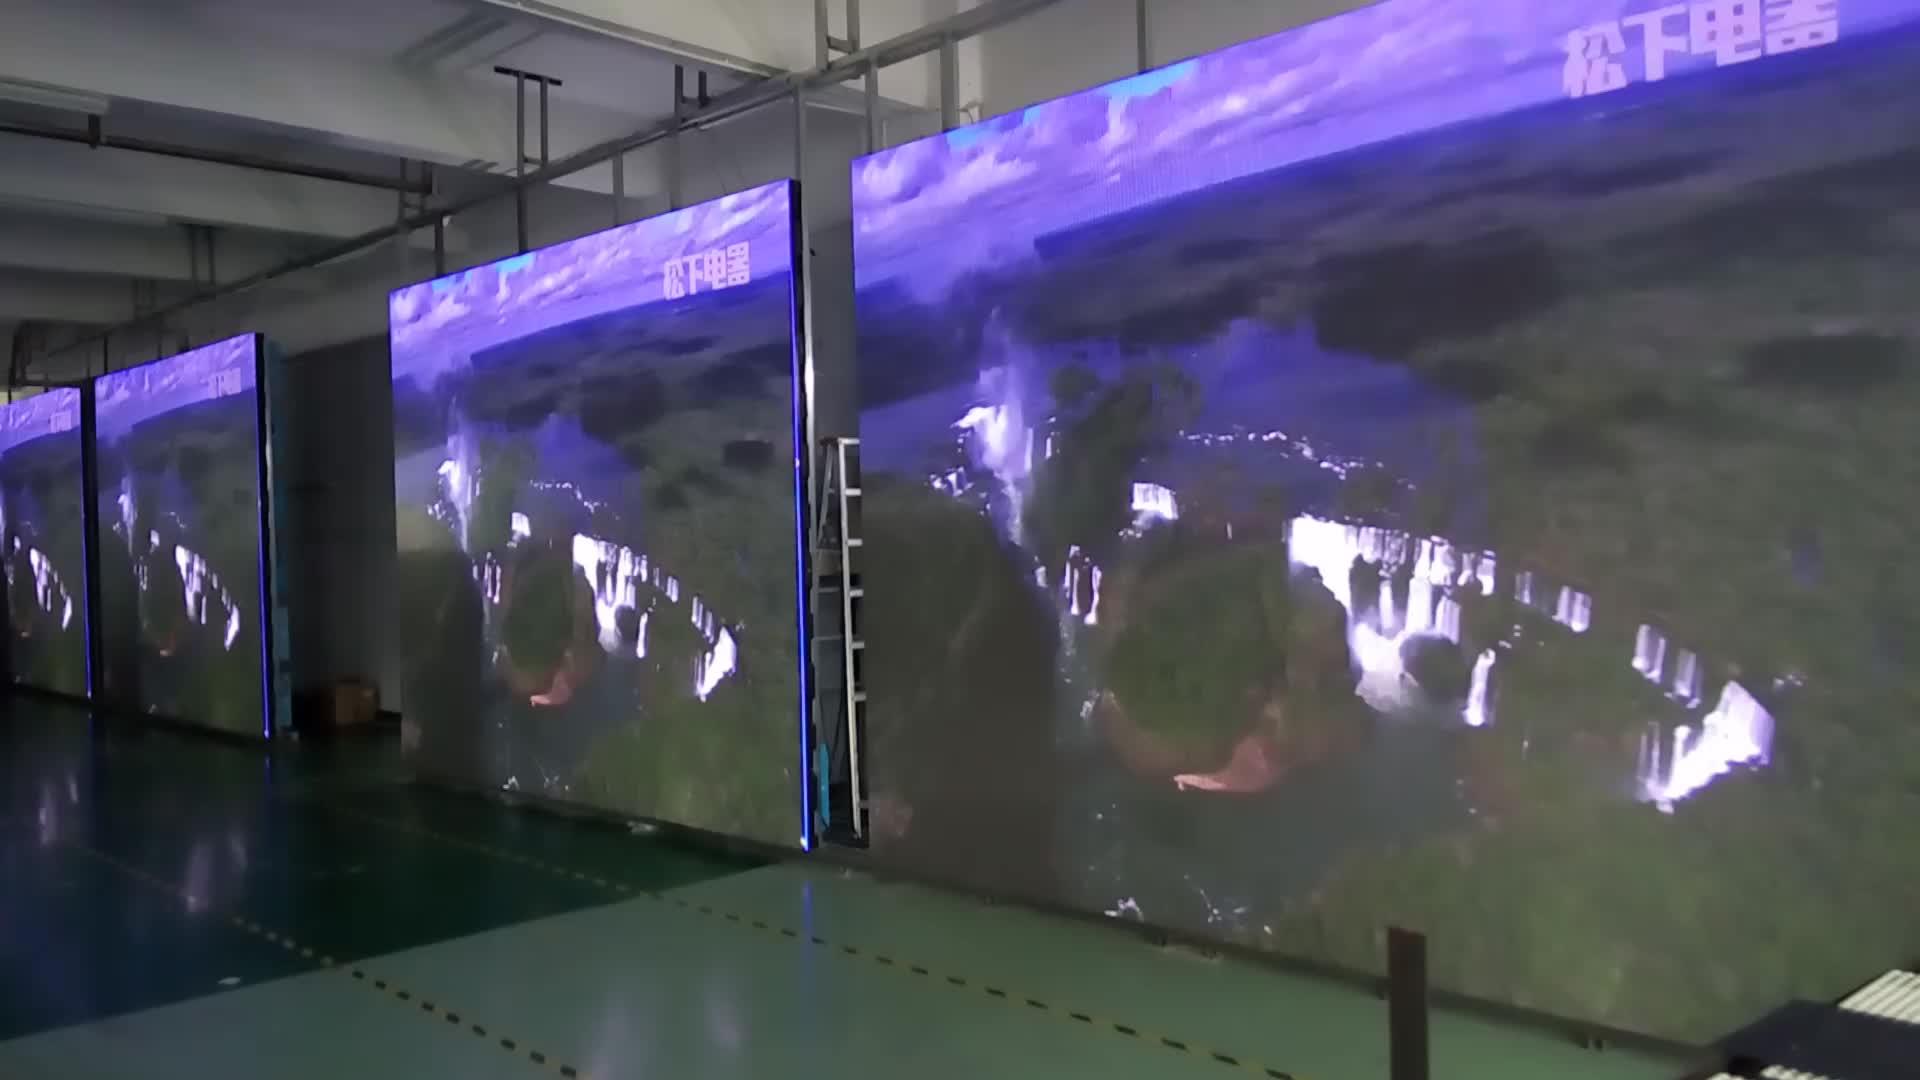 Outdoor waterproof Unilumin P4.81 led screen display advertising board IP65 LED billboard Rental Led Screen Display